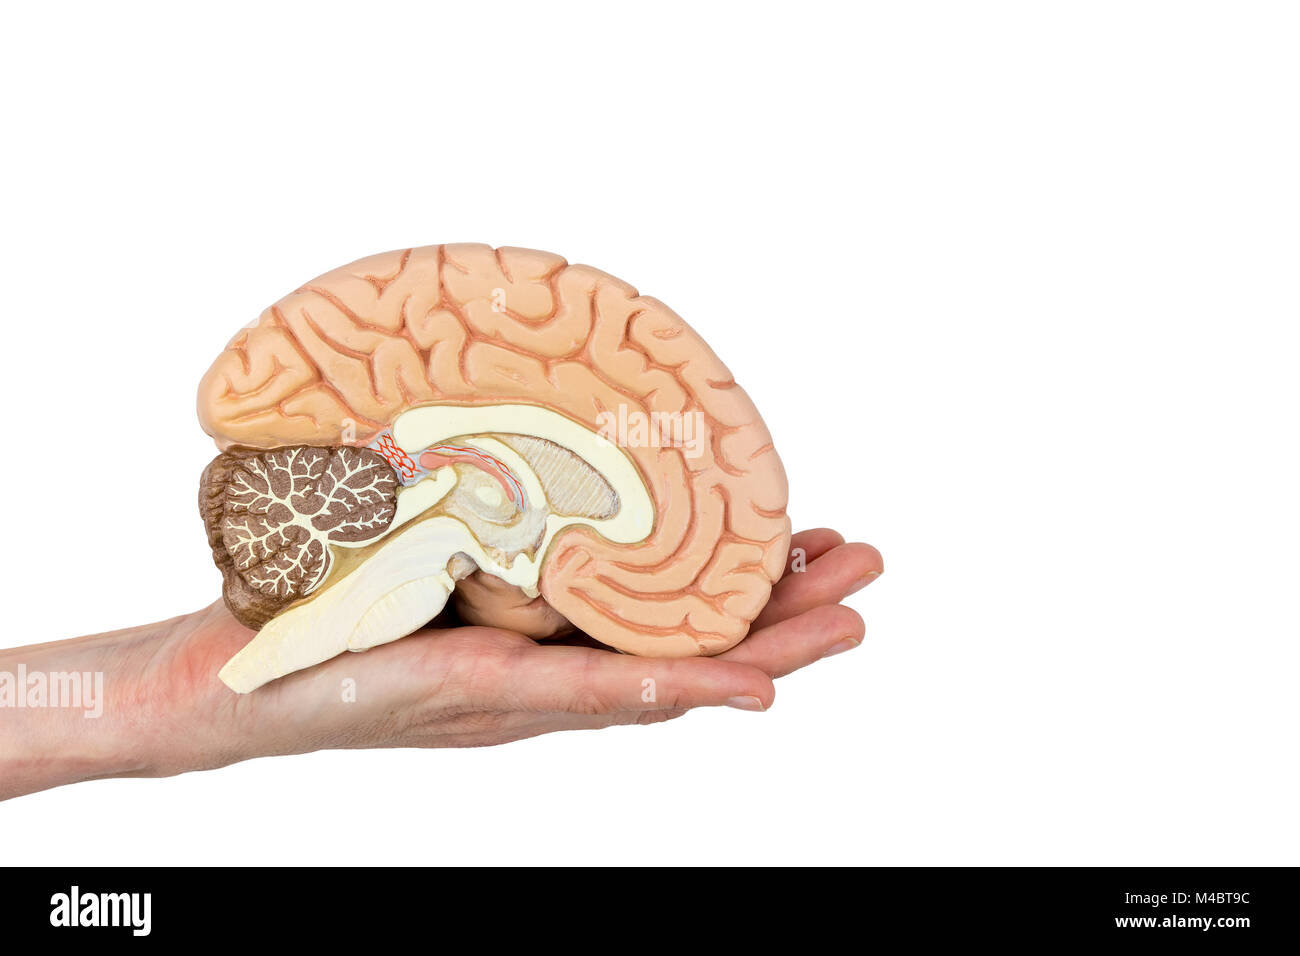 Hand holding brain hemisphere on white background Stock Photo ...